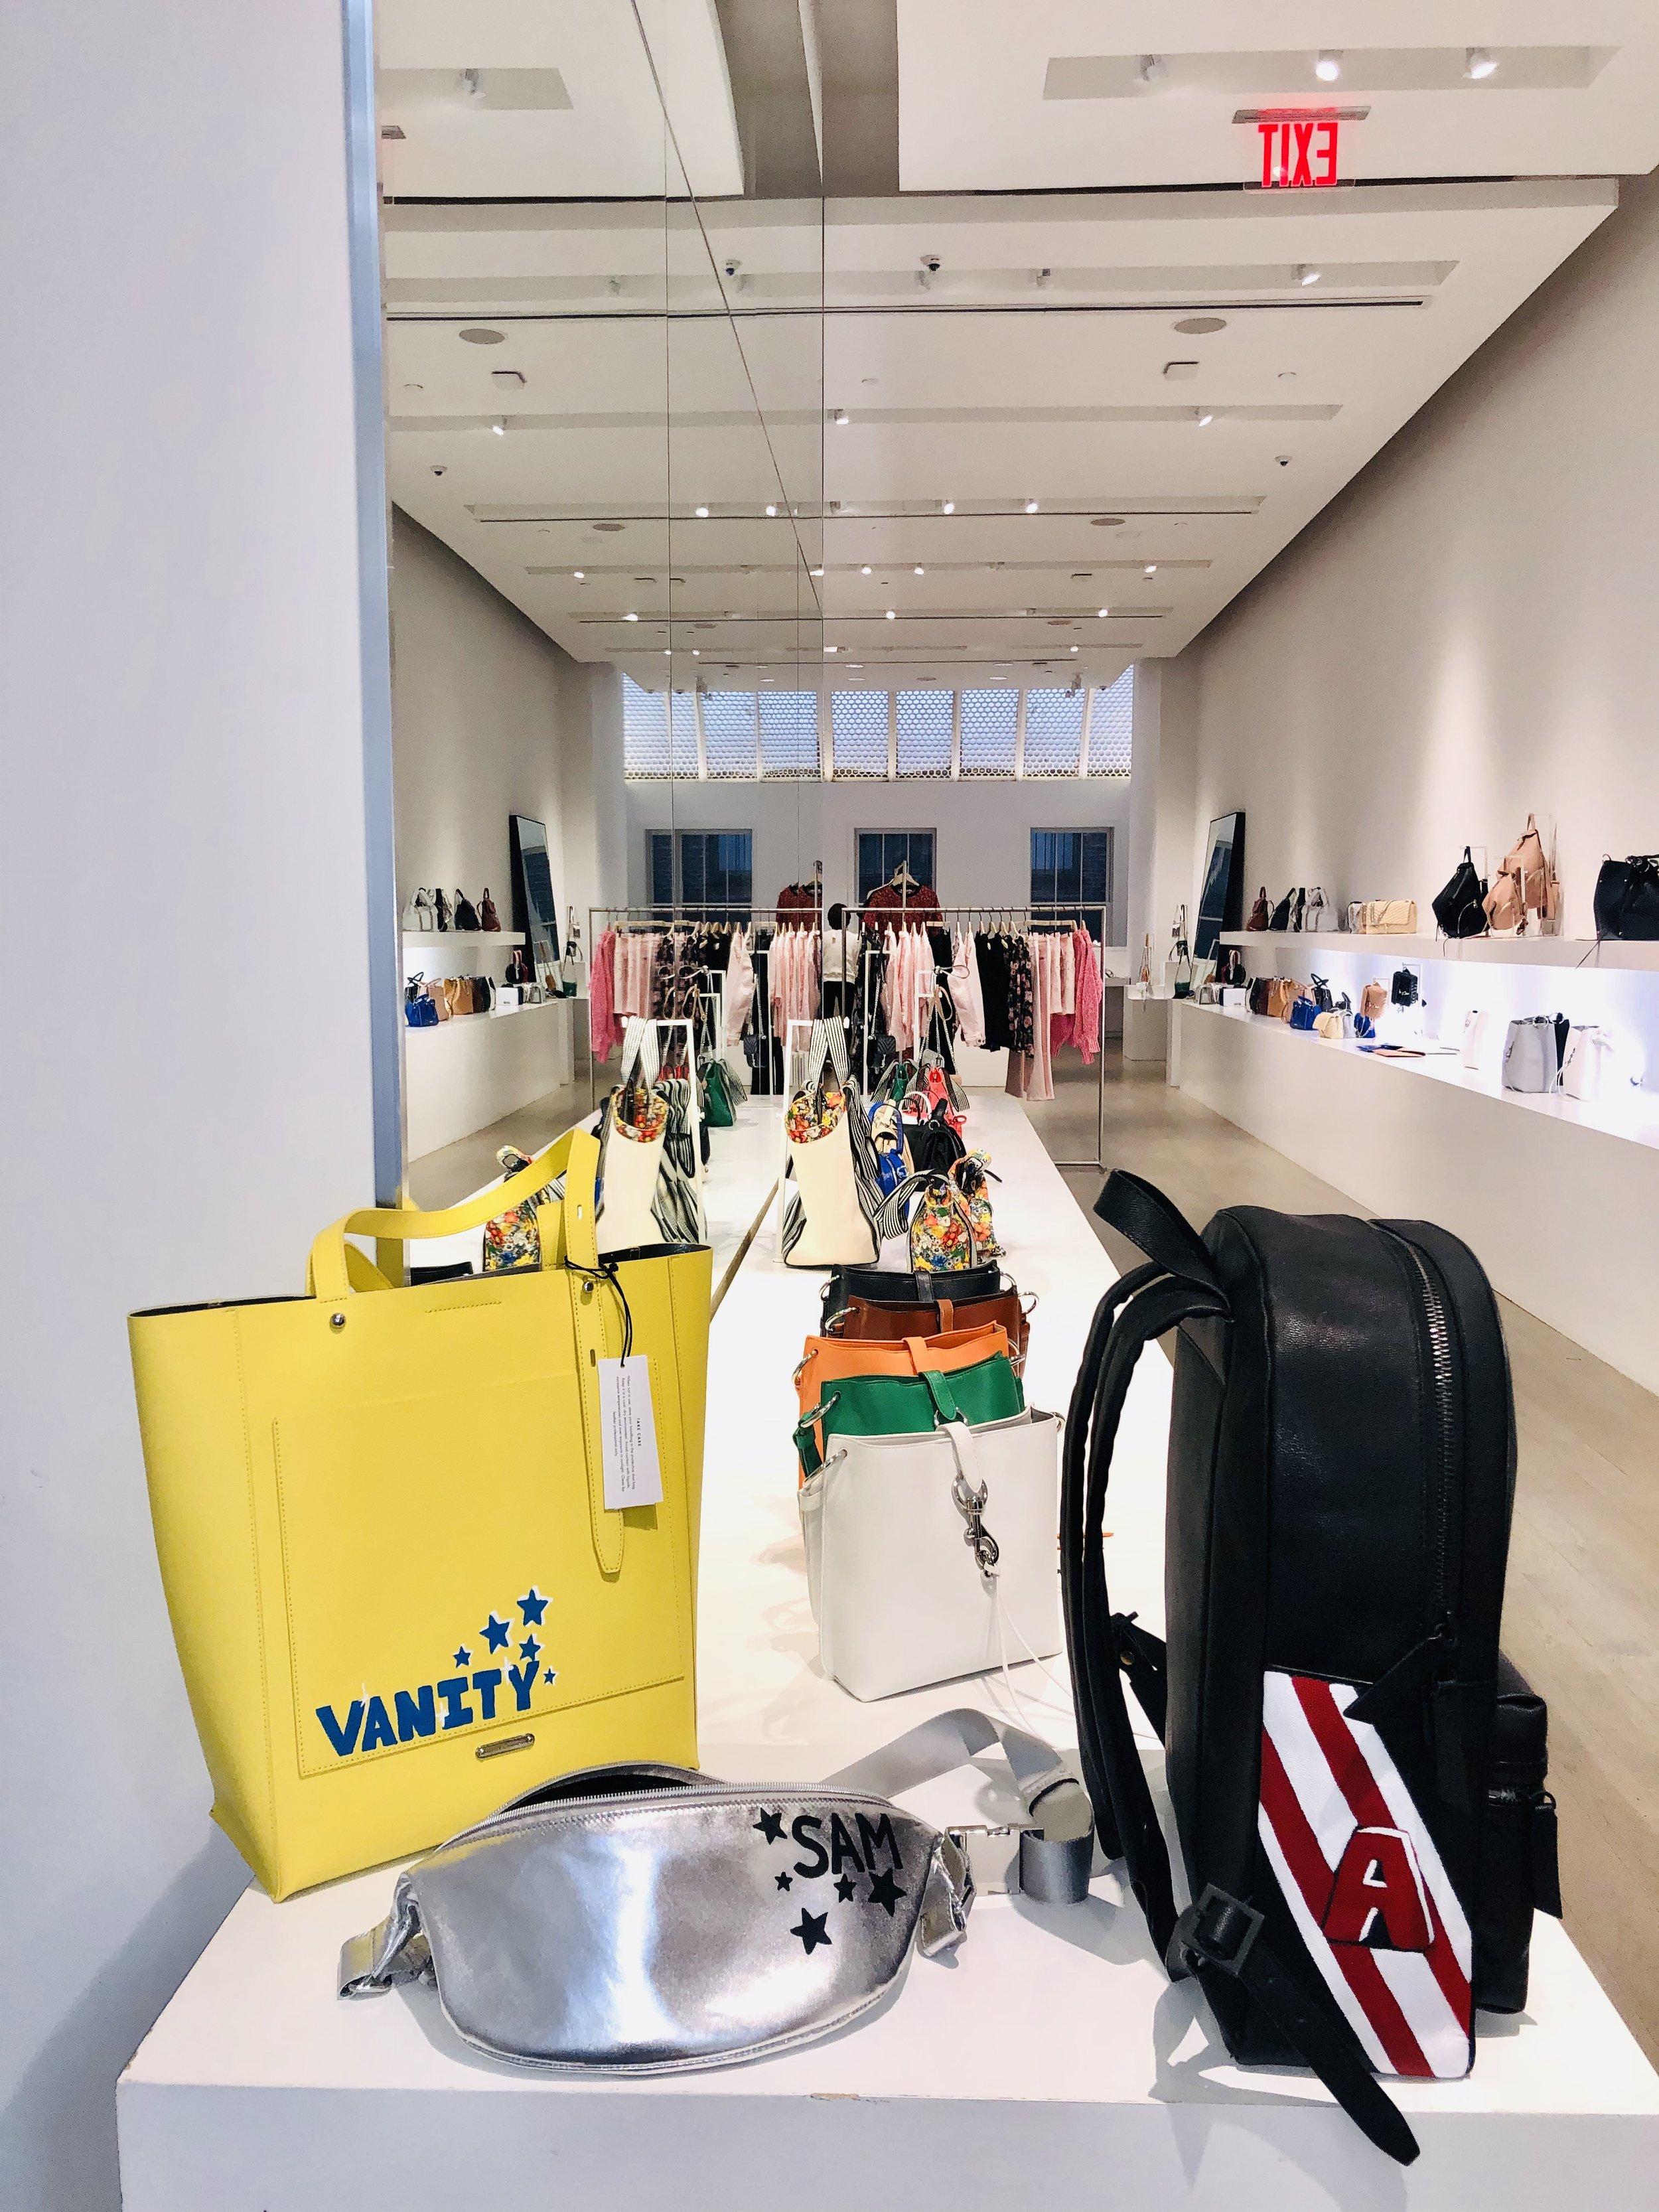 katrina-eugenia-rebecca-minkoff-myrm-rebecca-minkoff-bag-live-painting-live-painter-live-art-live-artist-nyc-greene-street-soho-new-york-city-nyc40.jpg